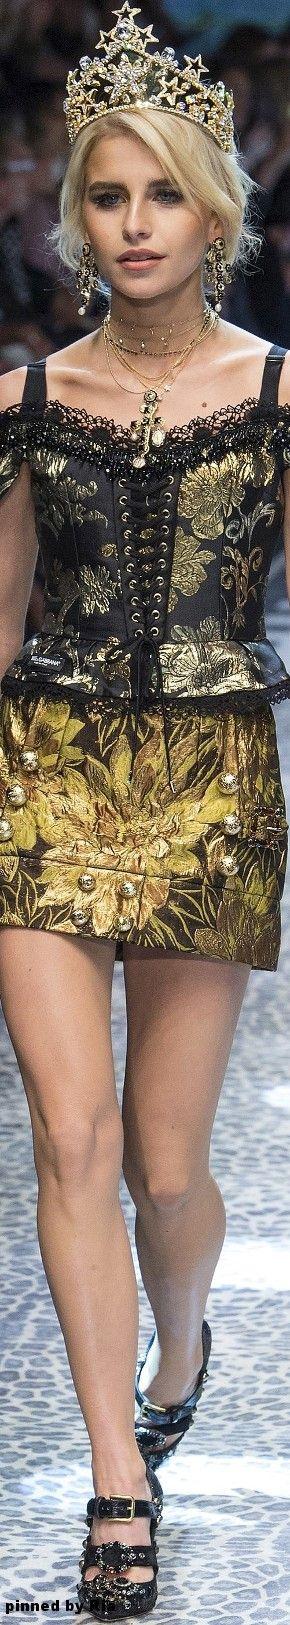 Dolce & Gabbana Fall 2017 RTW l Ria